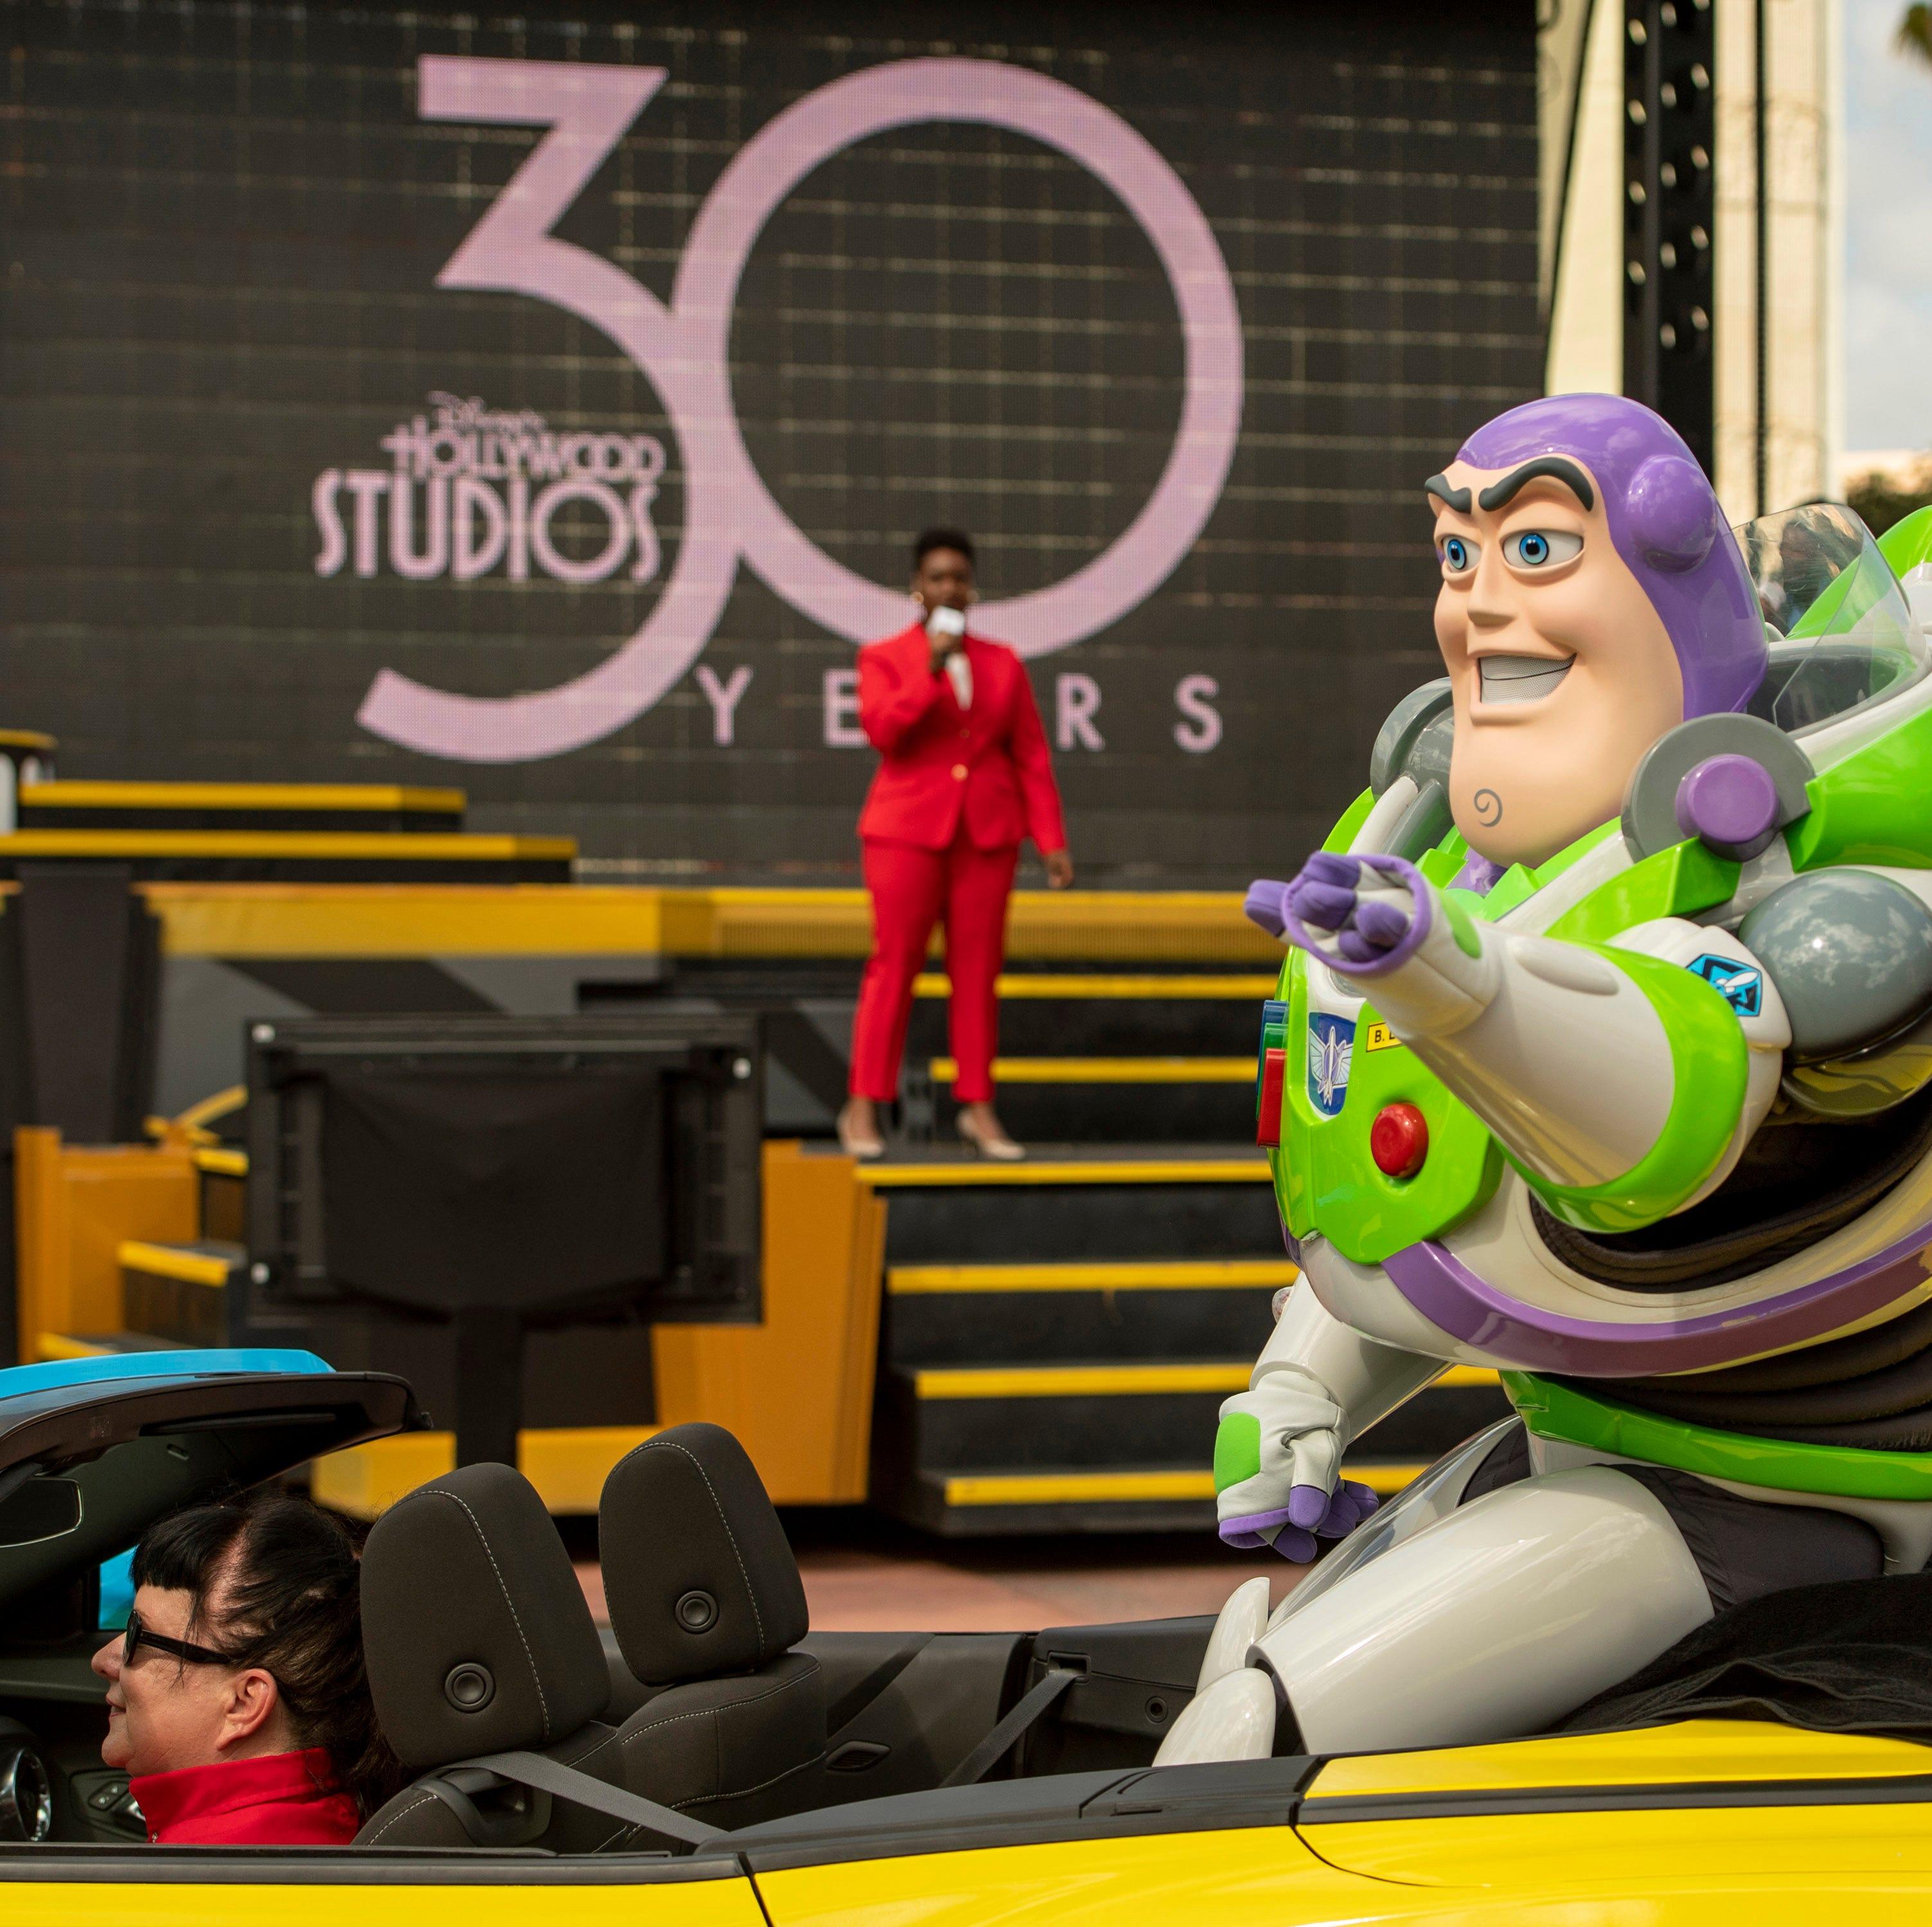 Disney's Hollywood Studios celebrates 30 years, looks to the future